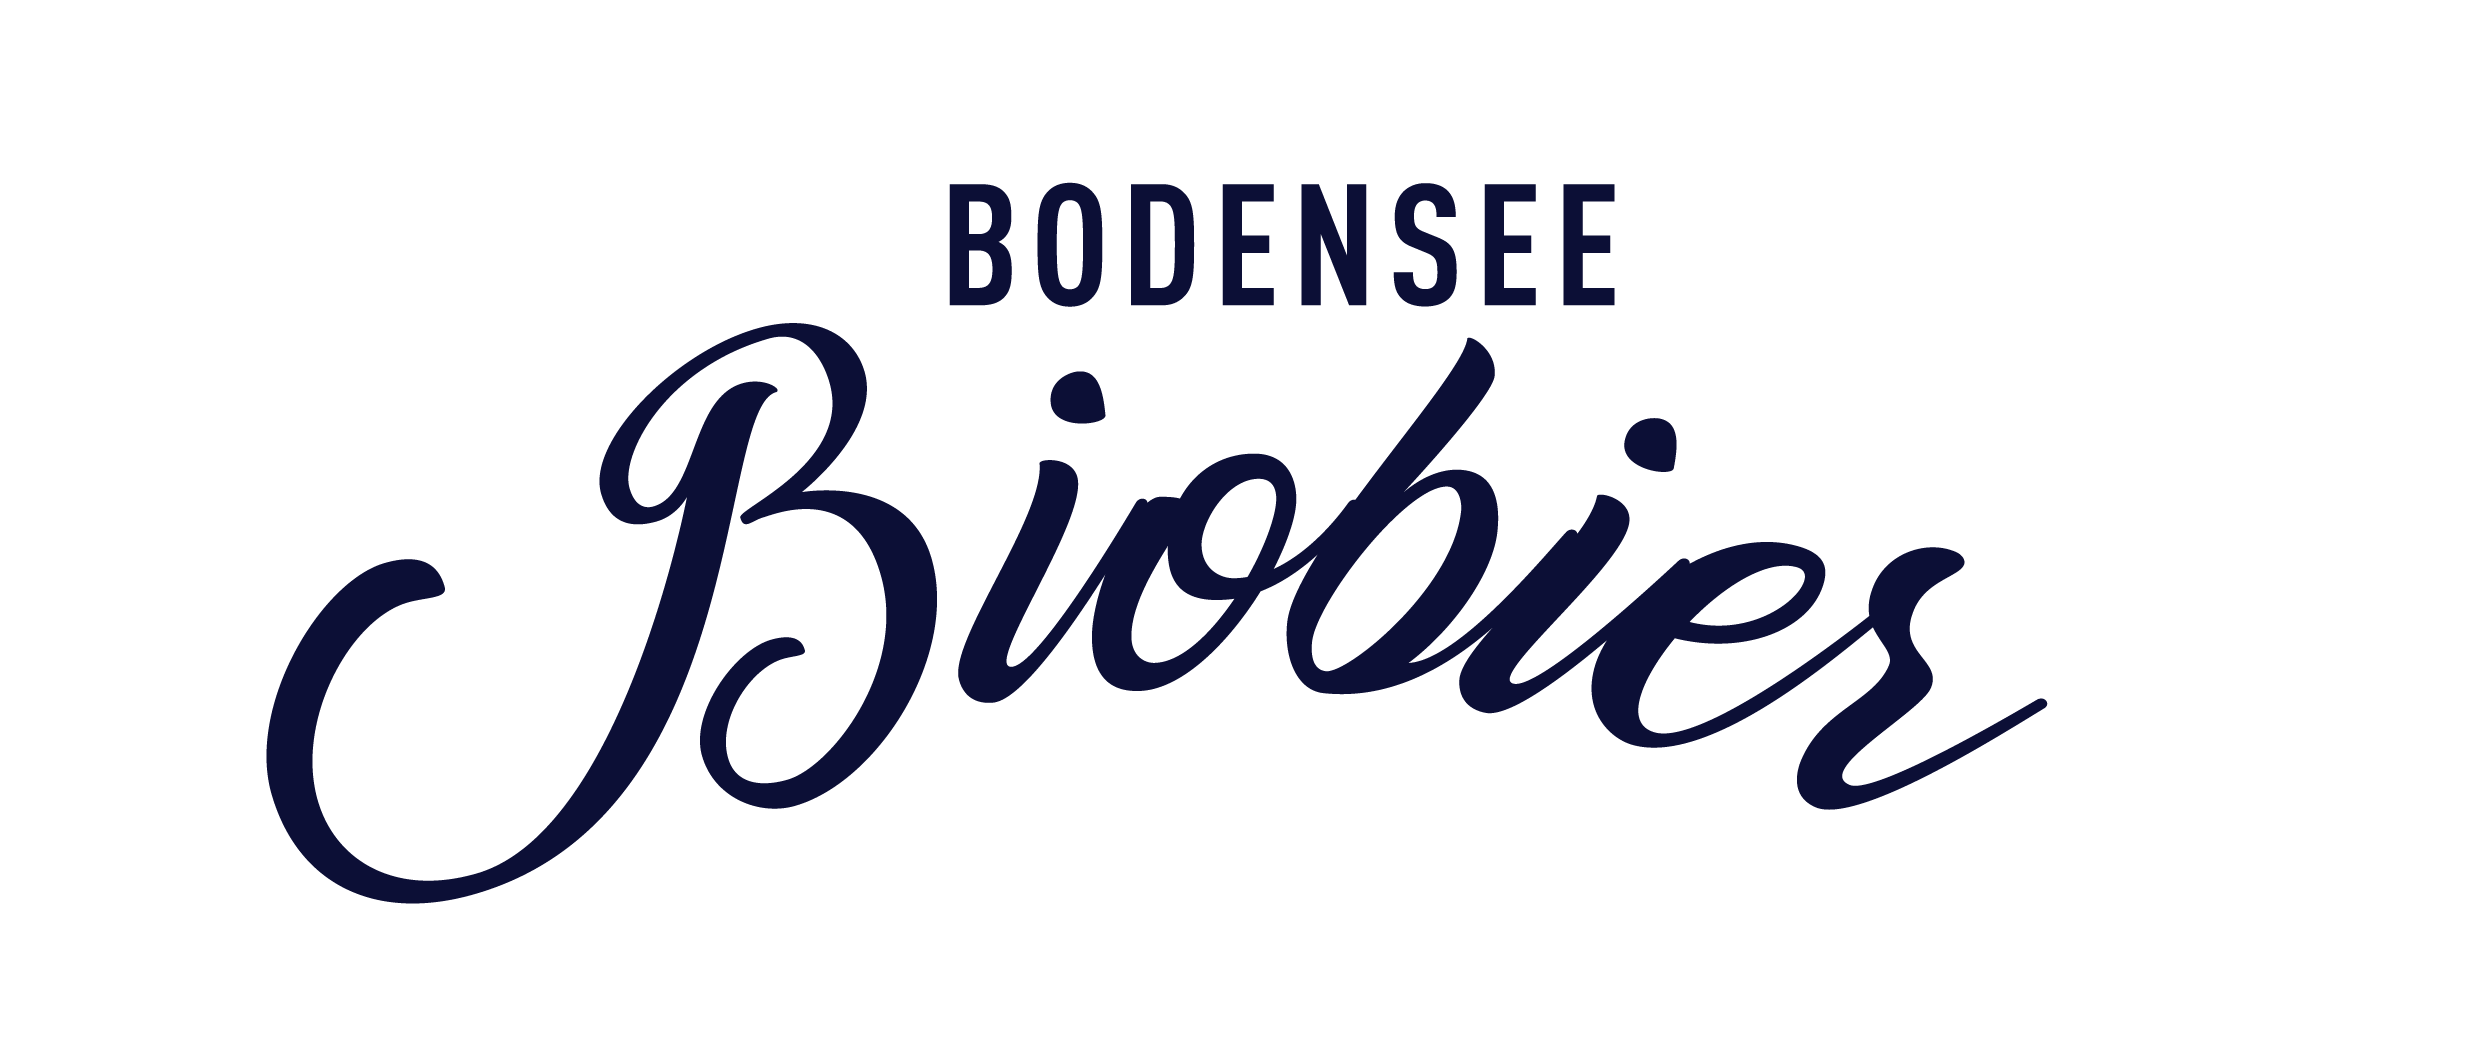 Bodensee-Biobier_Logo